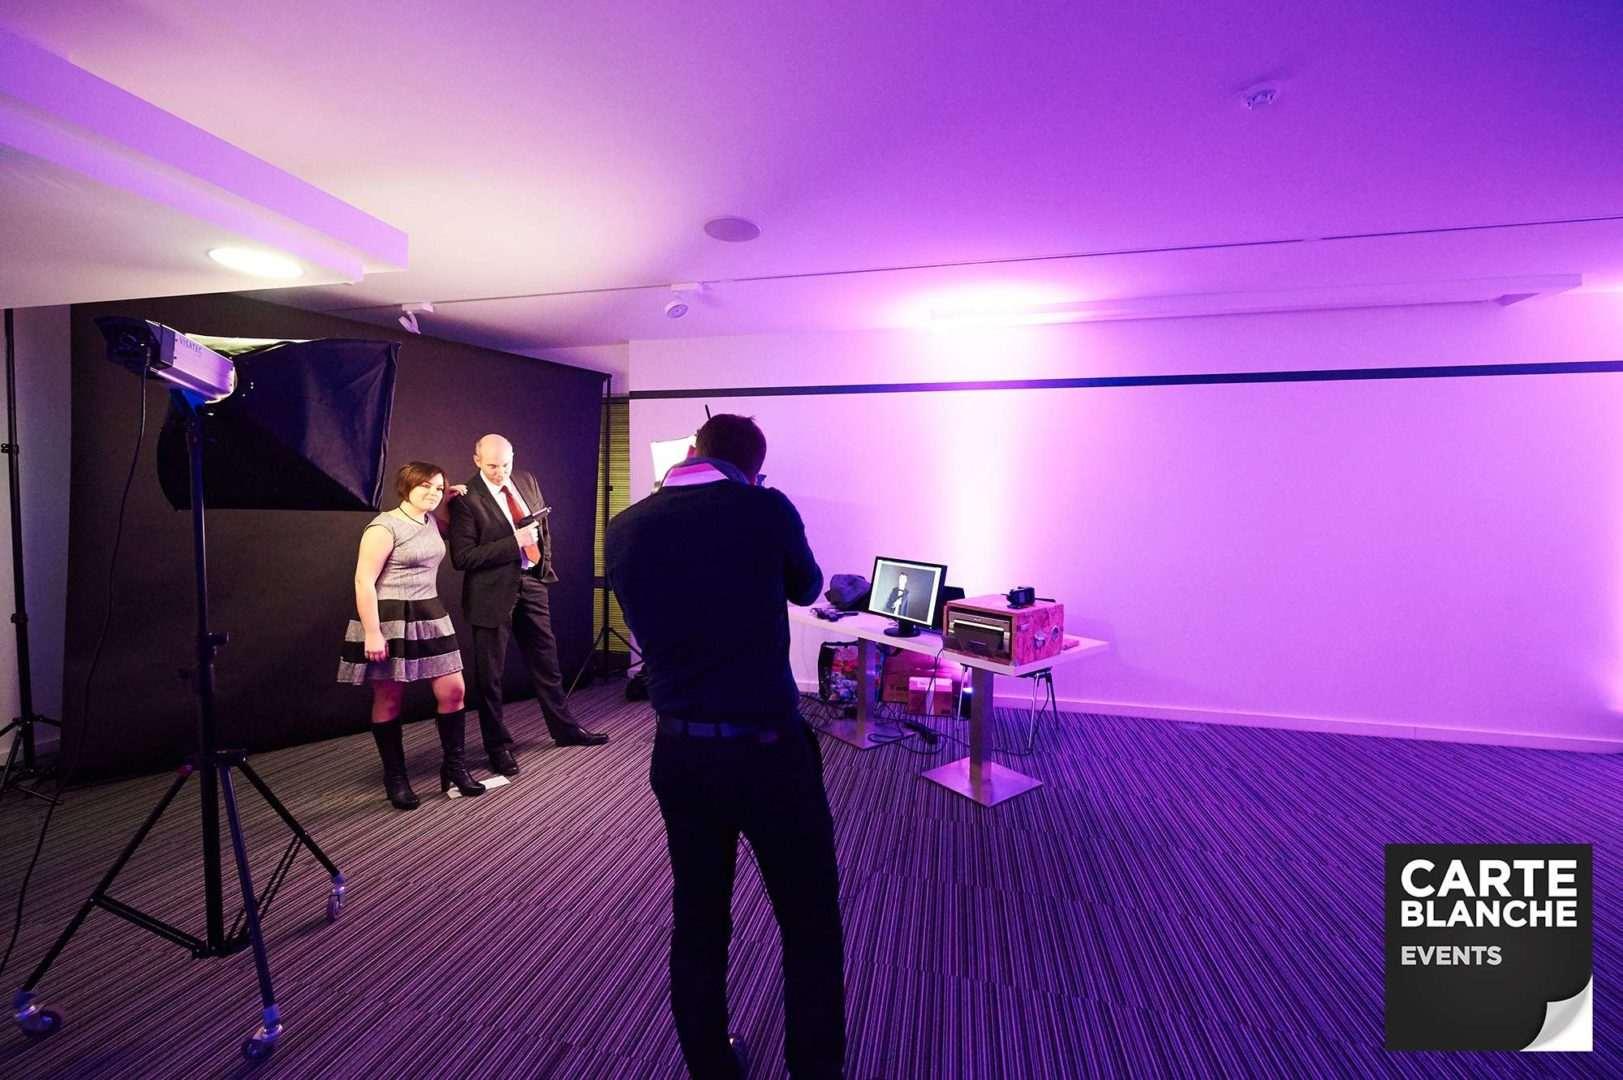 xmas-degroof-petercam-2015-017-luxembourg-event